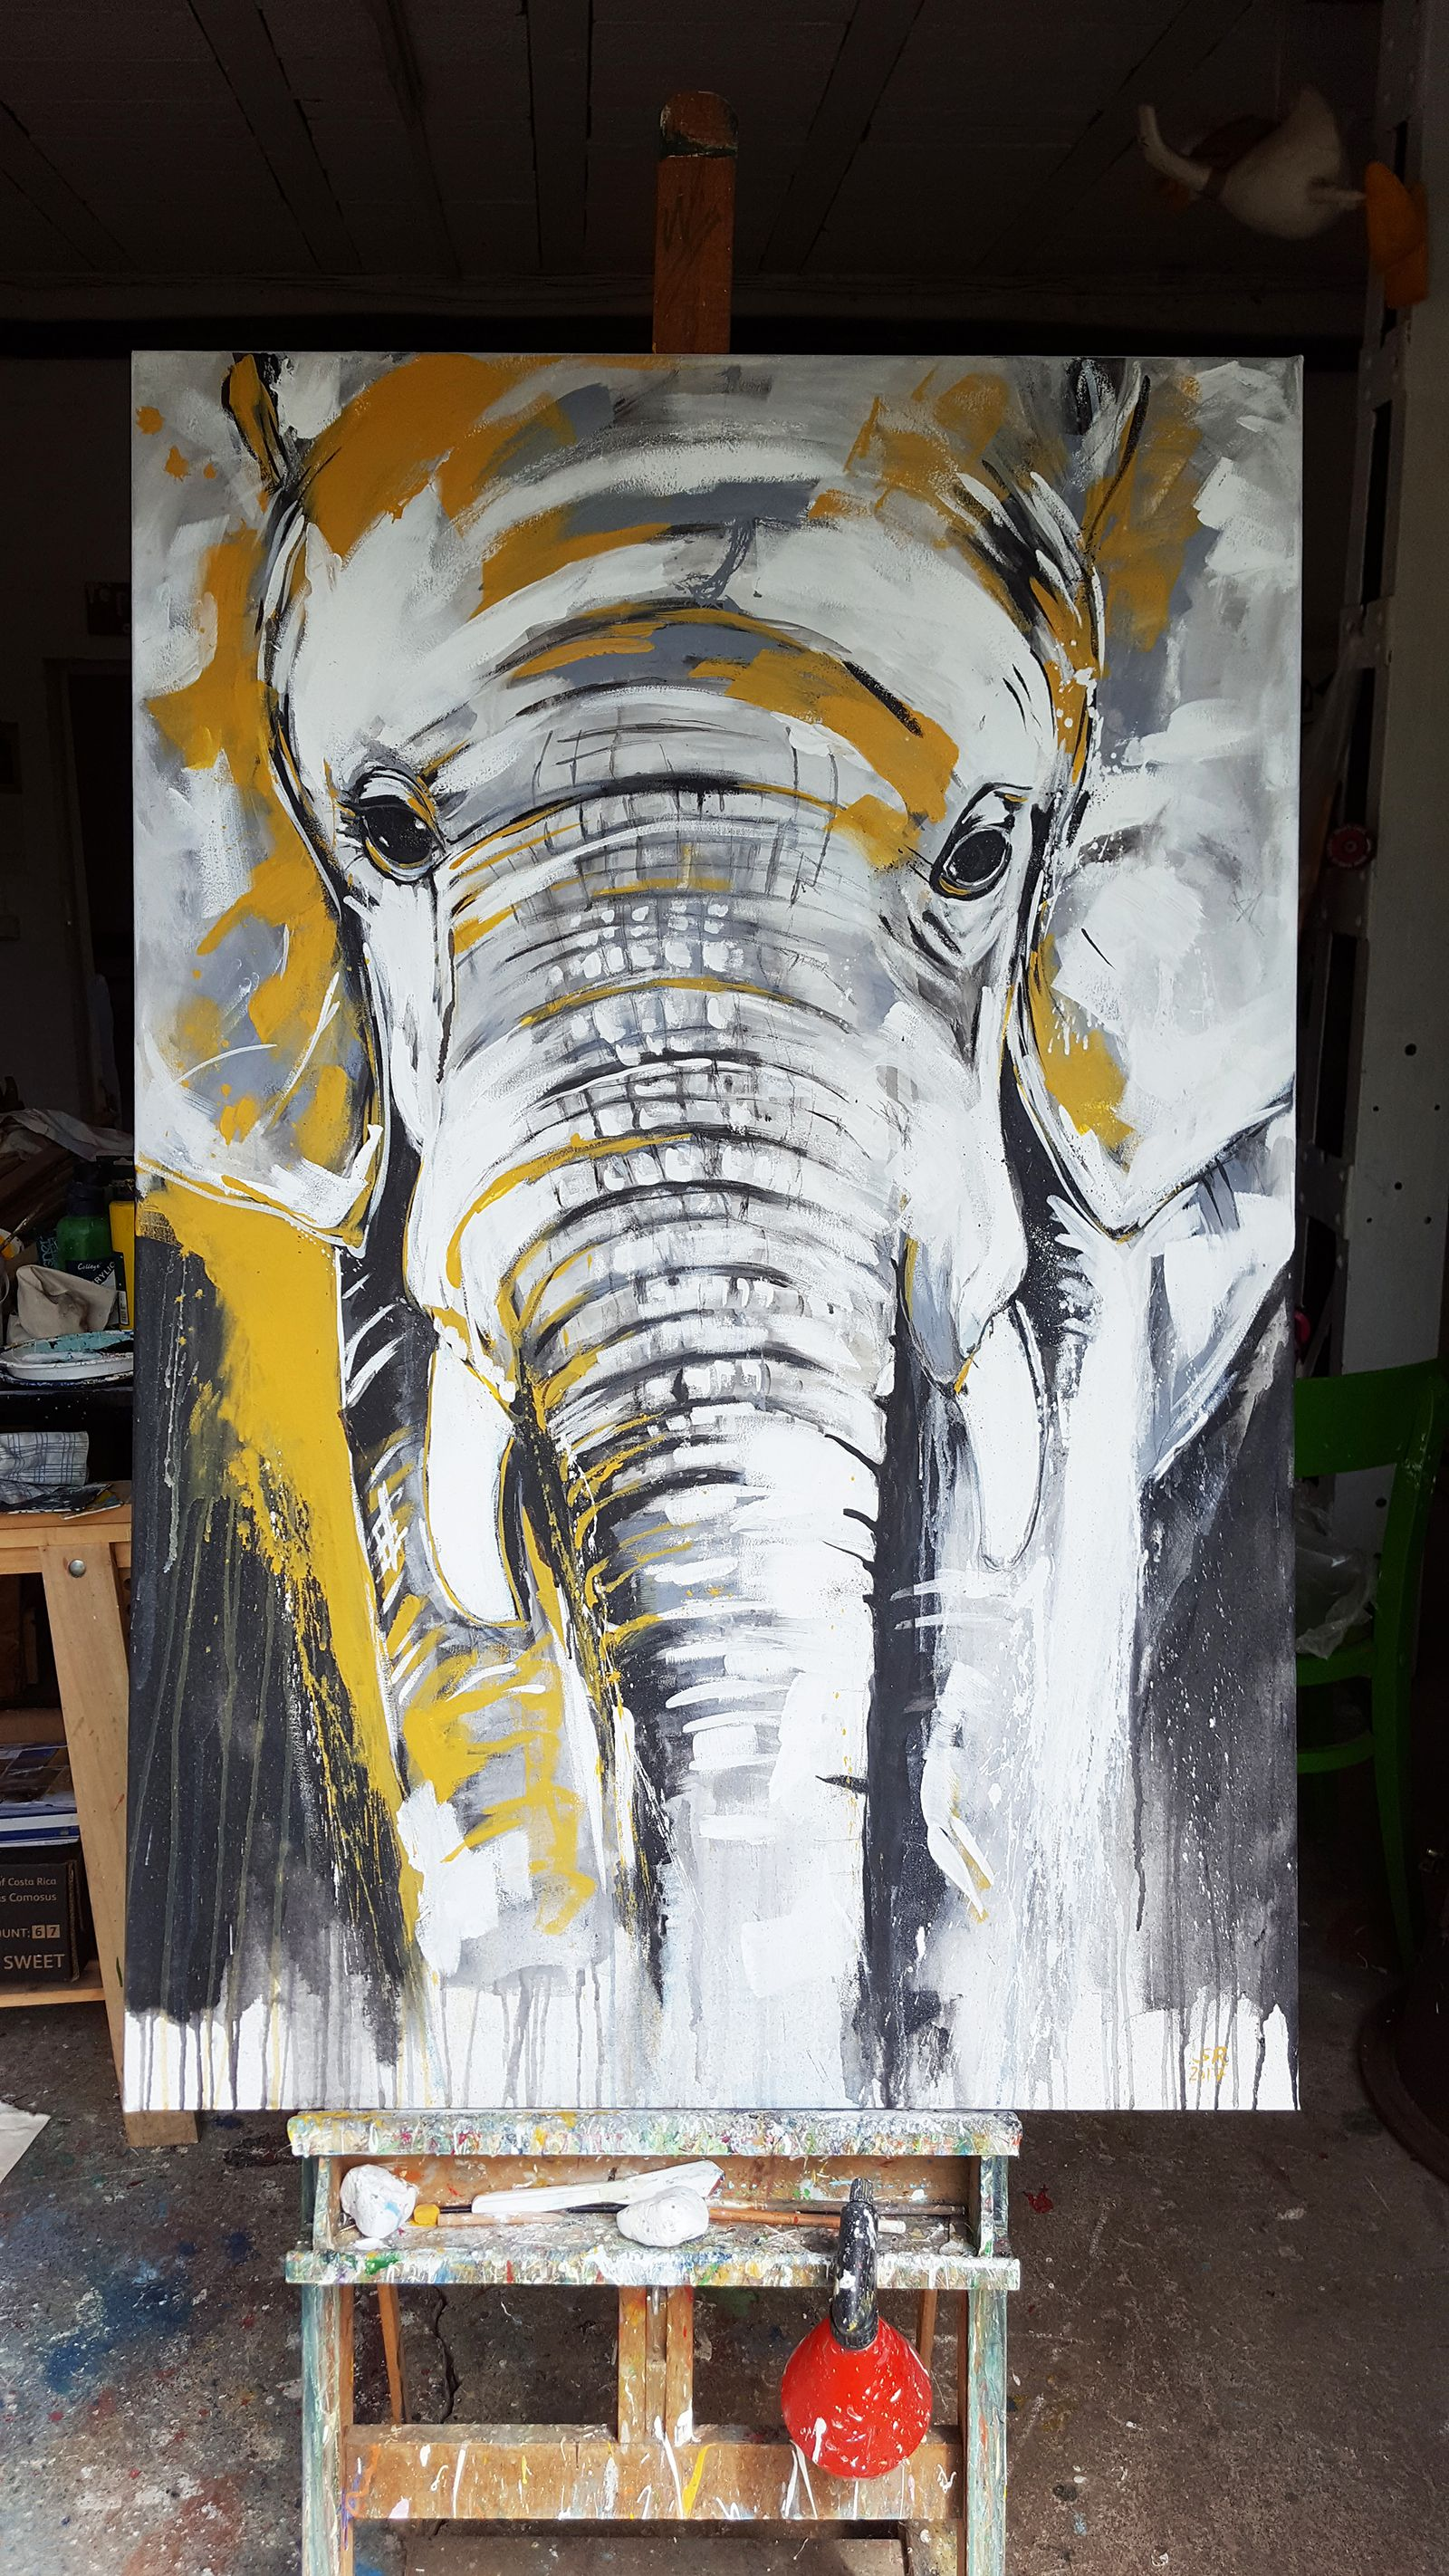 elefant 2 expressive malerei auf gro formatiger leinwand art pinterest paintings. Black Bedroom Furniture Sets. Home Design Ideas